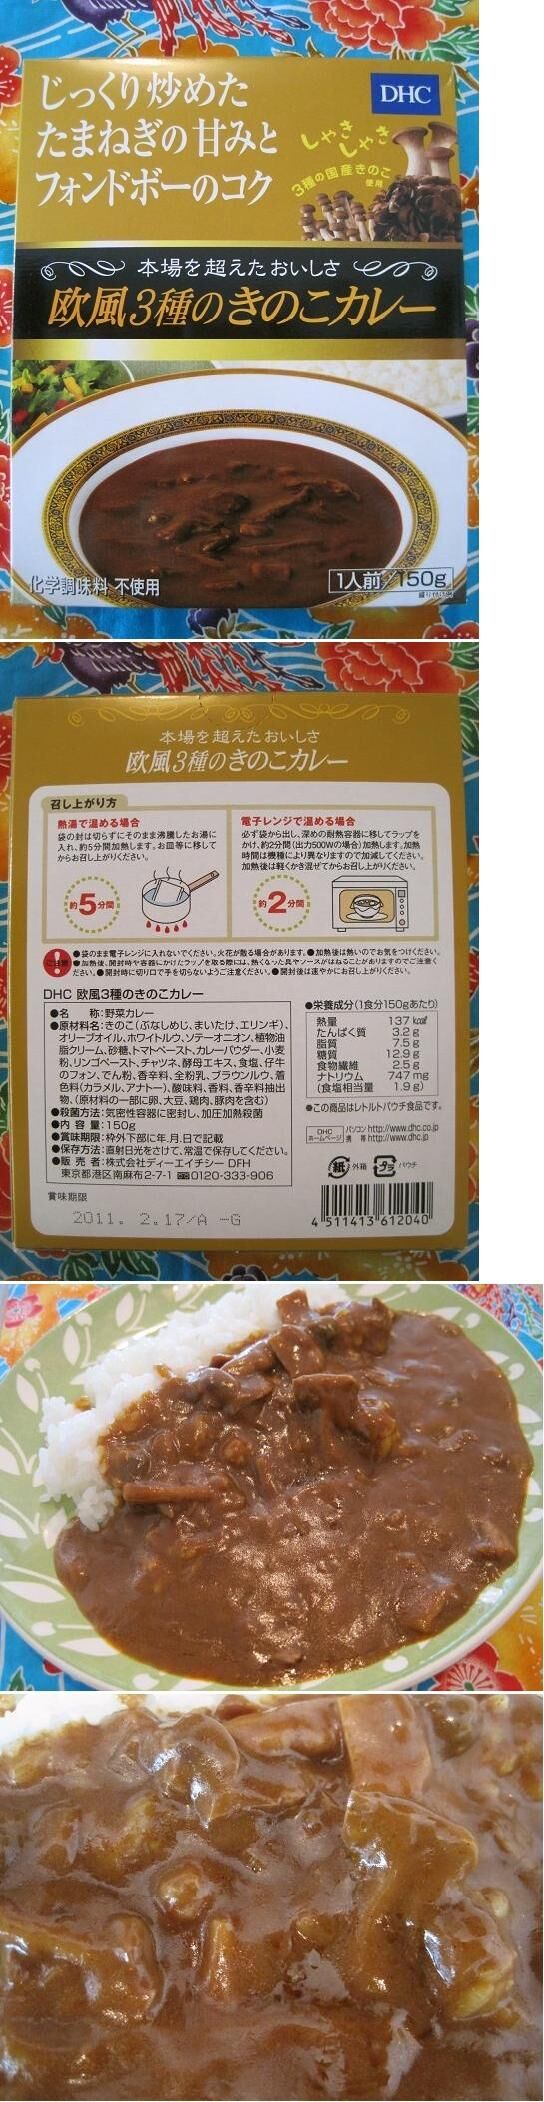 https://livedoor.blogimg.jp/emineee/imgs/7/3/7360a839.jpg